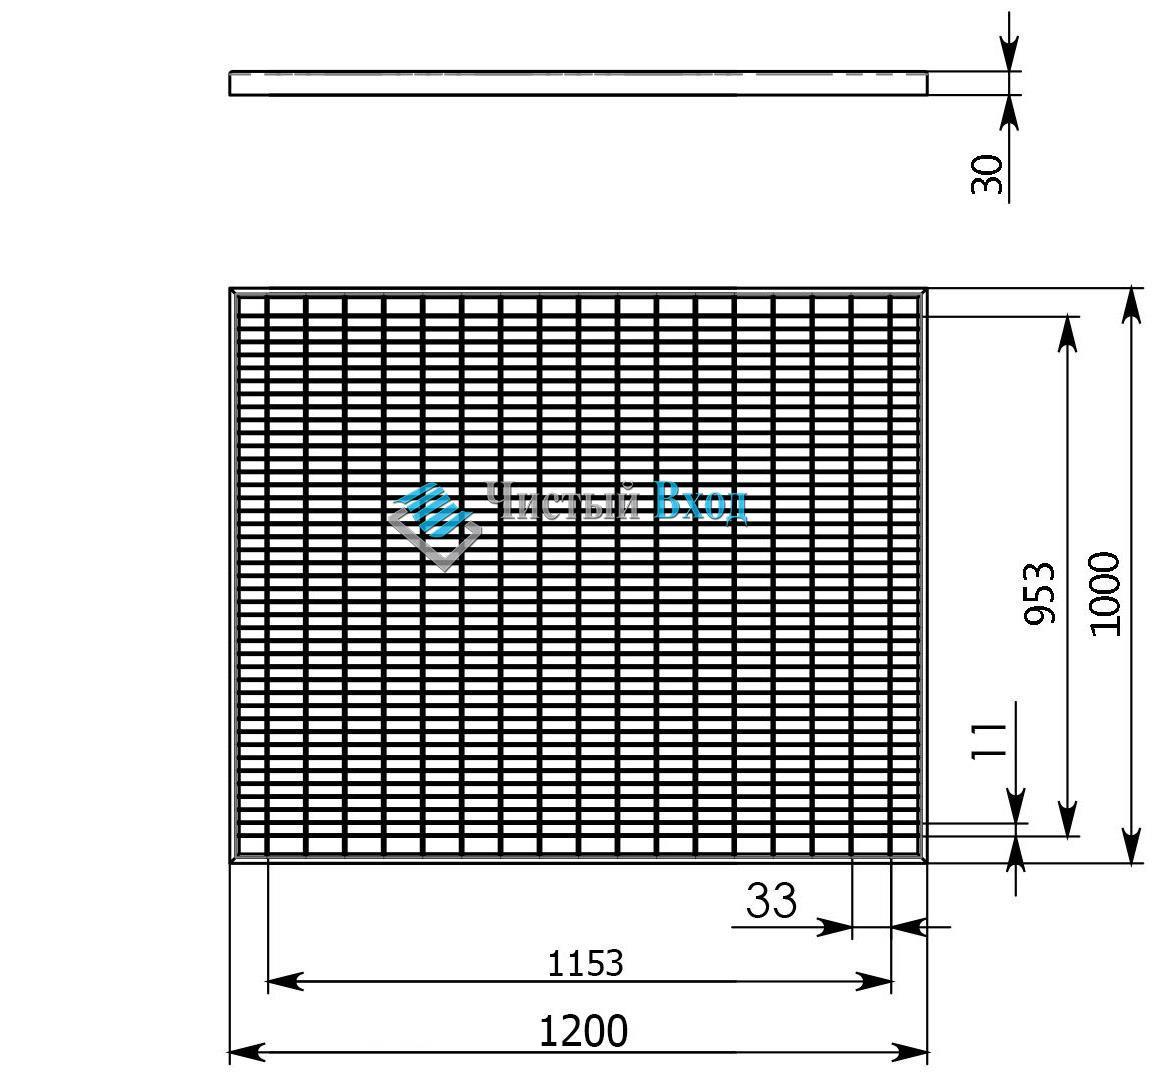 Стальная оцинкованная решетка 33х11/30х2 RA - 1200х1000мм. с ячейкой наоборот